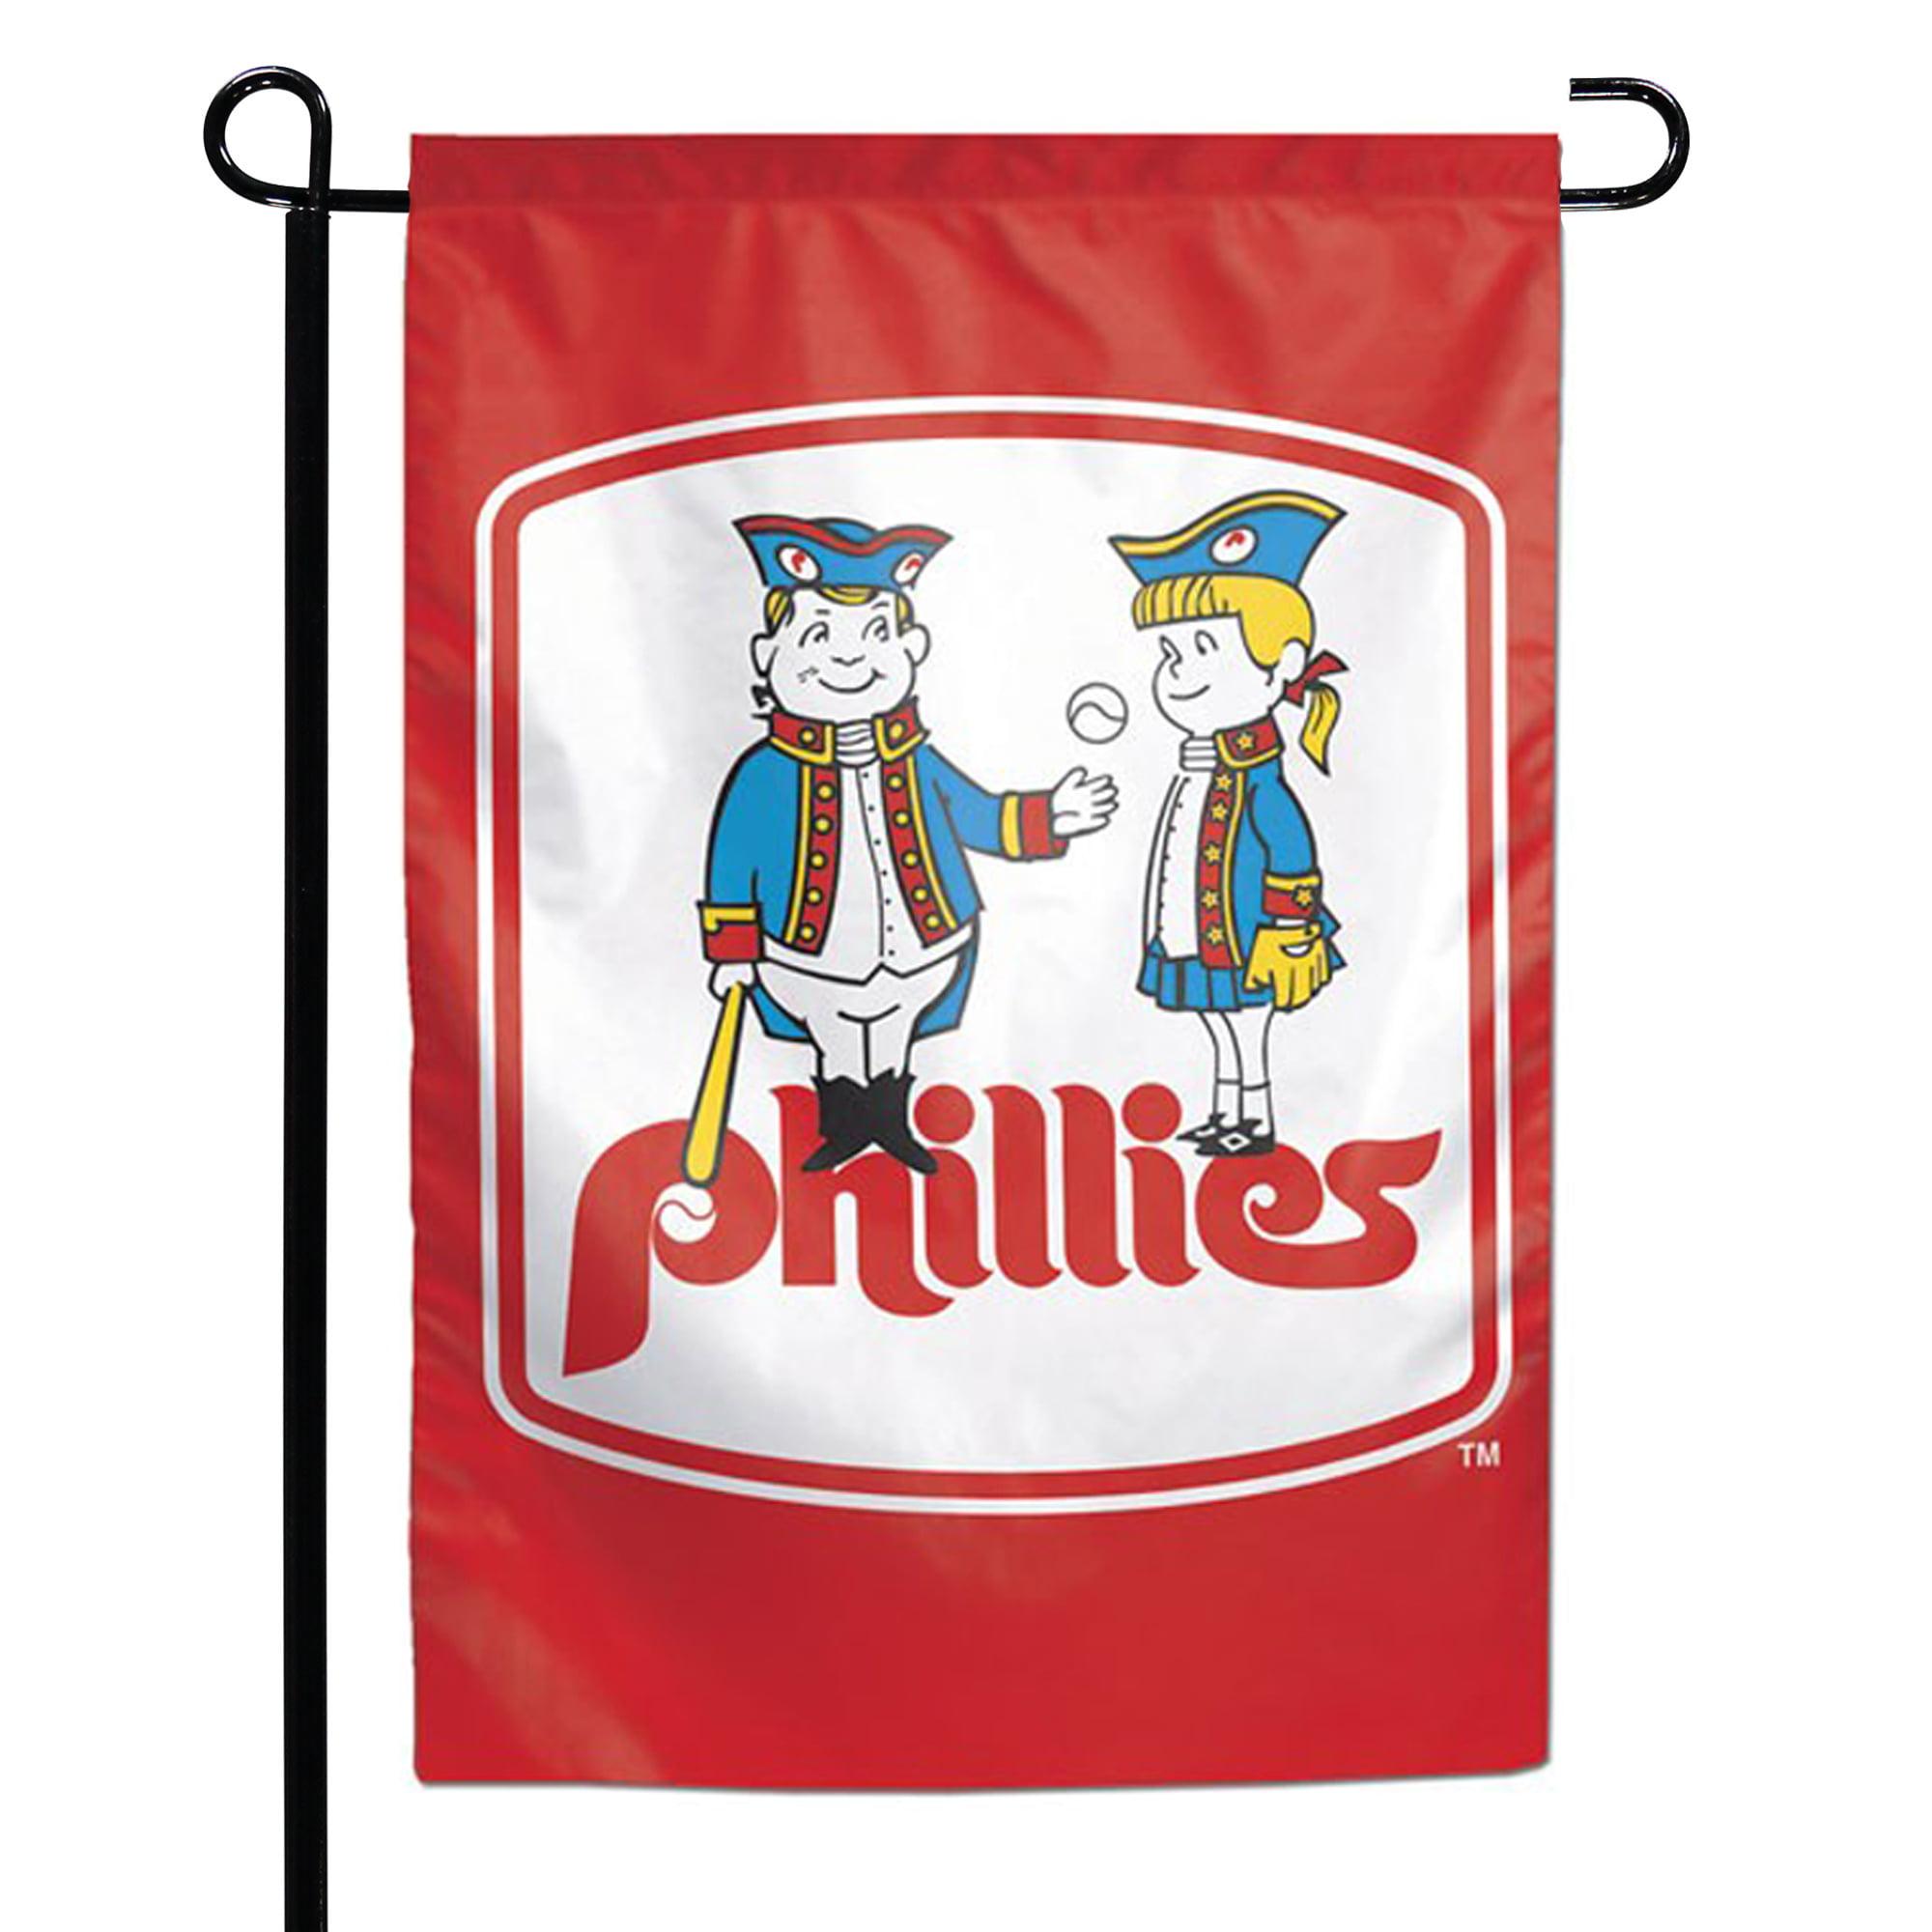 "Philadelphia Phillies WinCraft 12.5"" x 18"" Double-Sided Garden Flag - No Size"